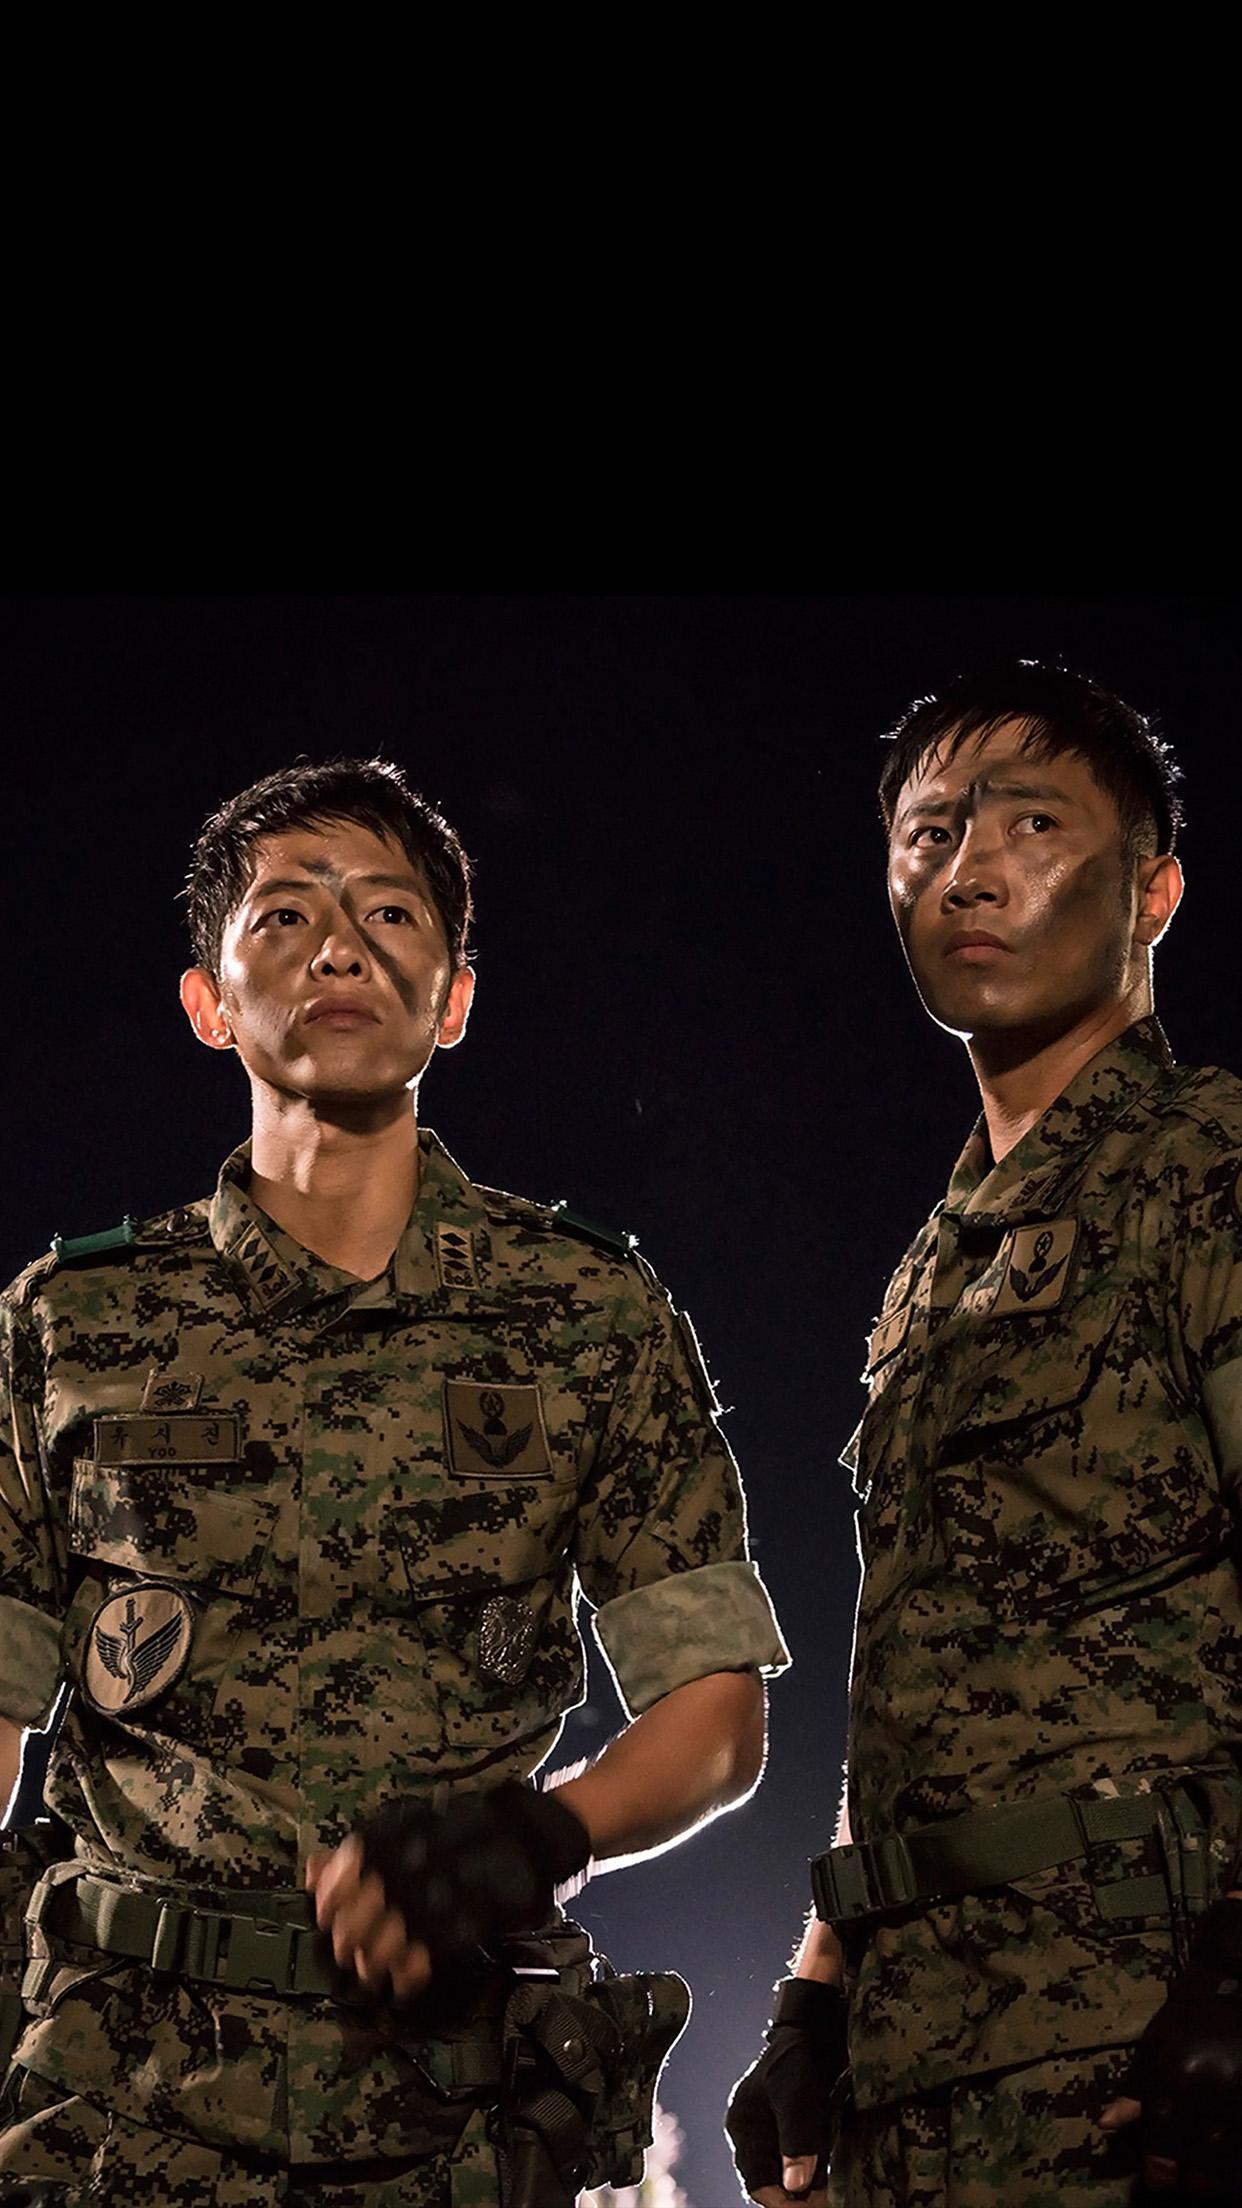 Hi05 Kpop Sun Song Joonggi Military Descendants Of The Sun